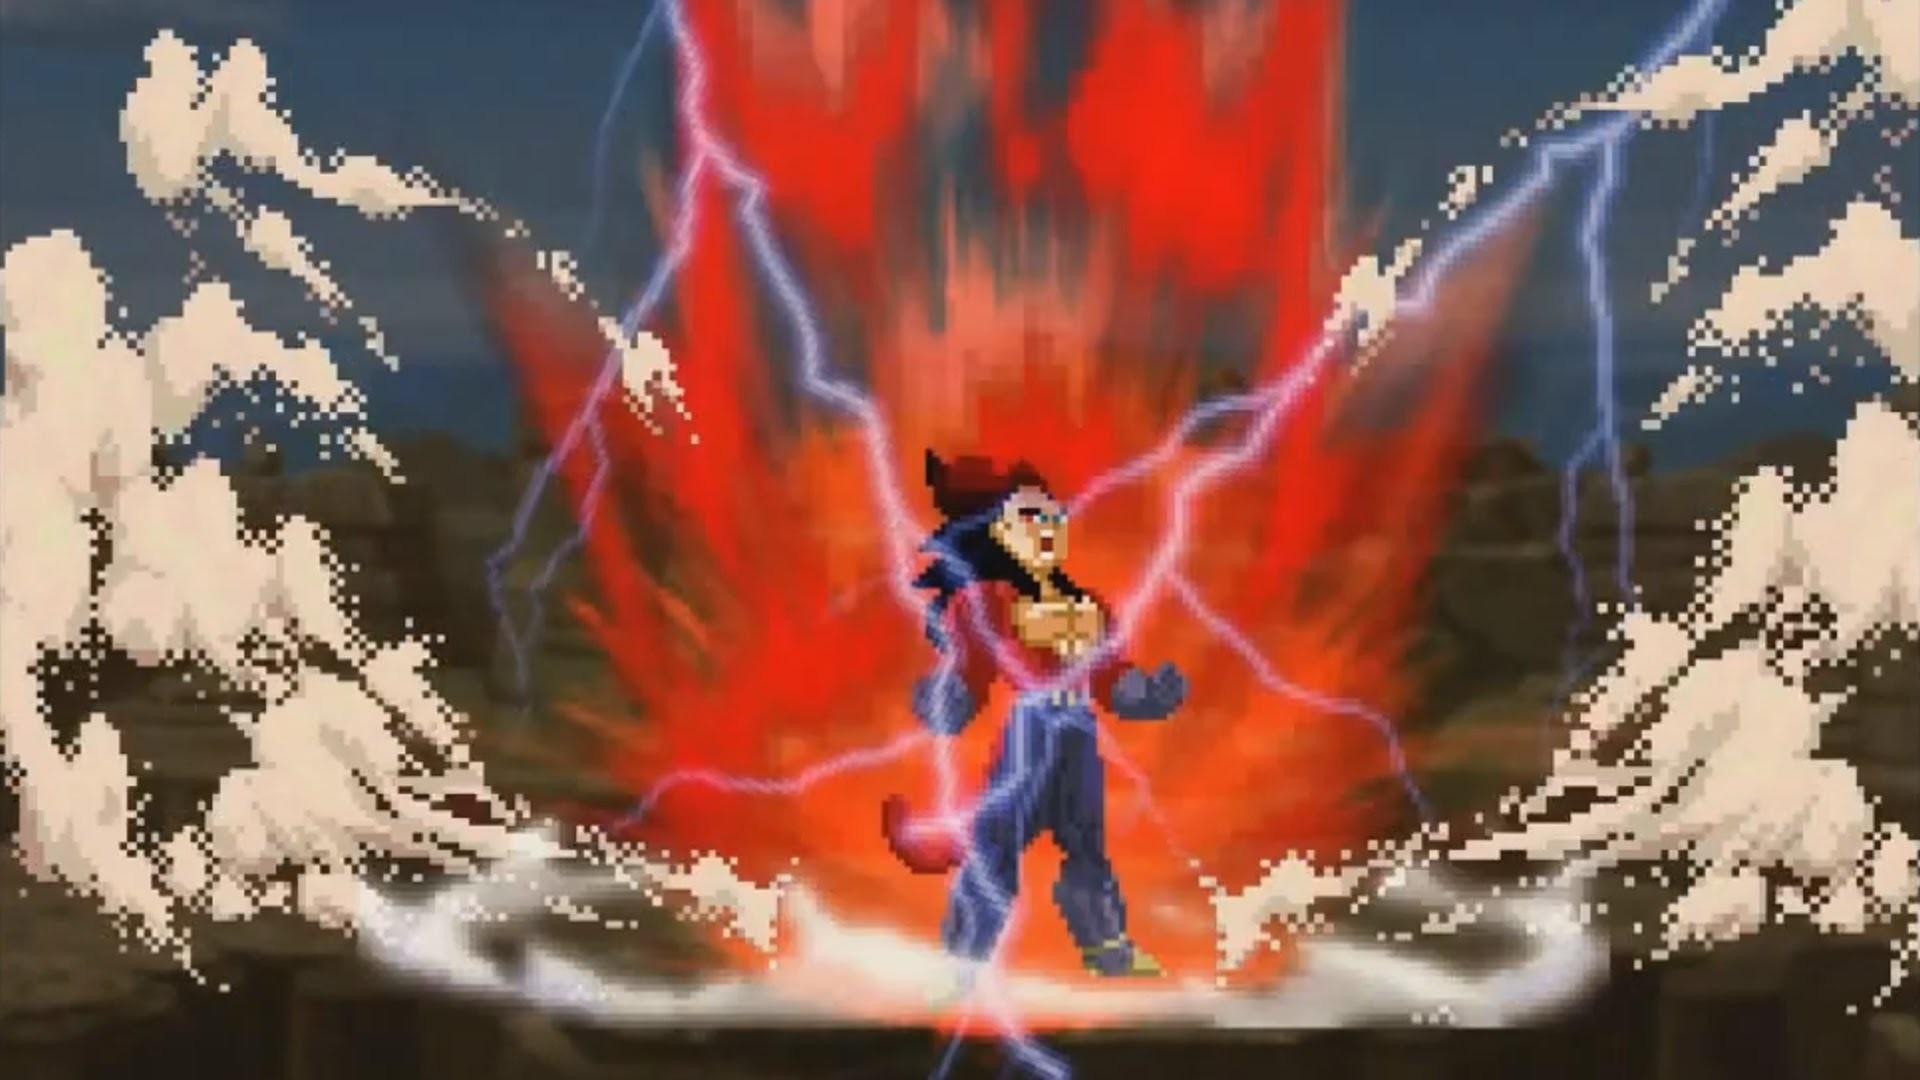 Goku And Vegeta Transformation Super Saiyan 5 (Sprite Animation) – YouTube